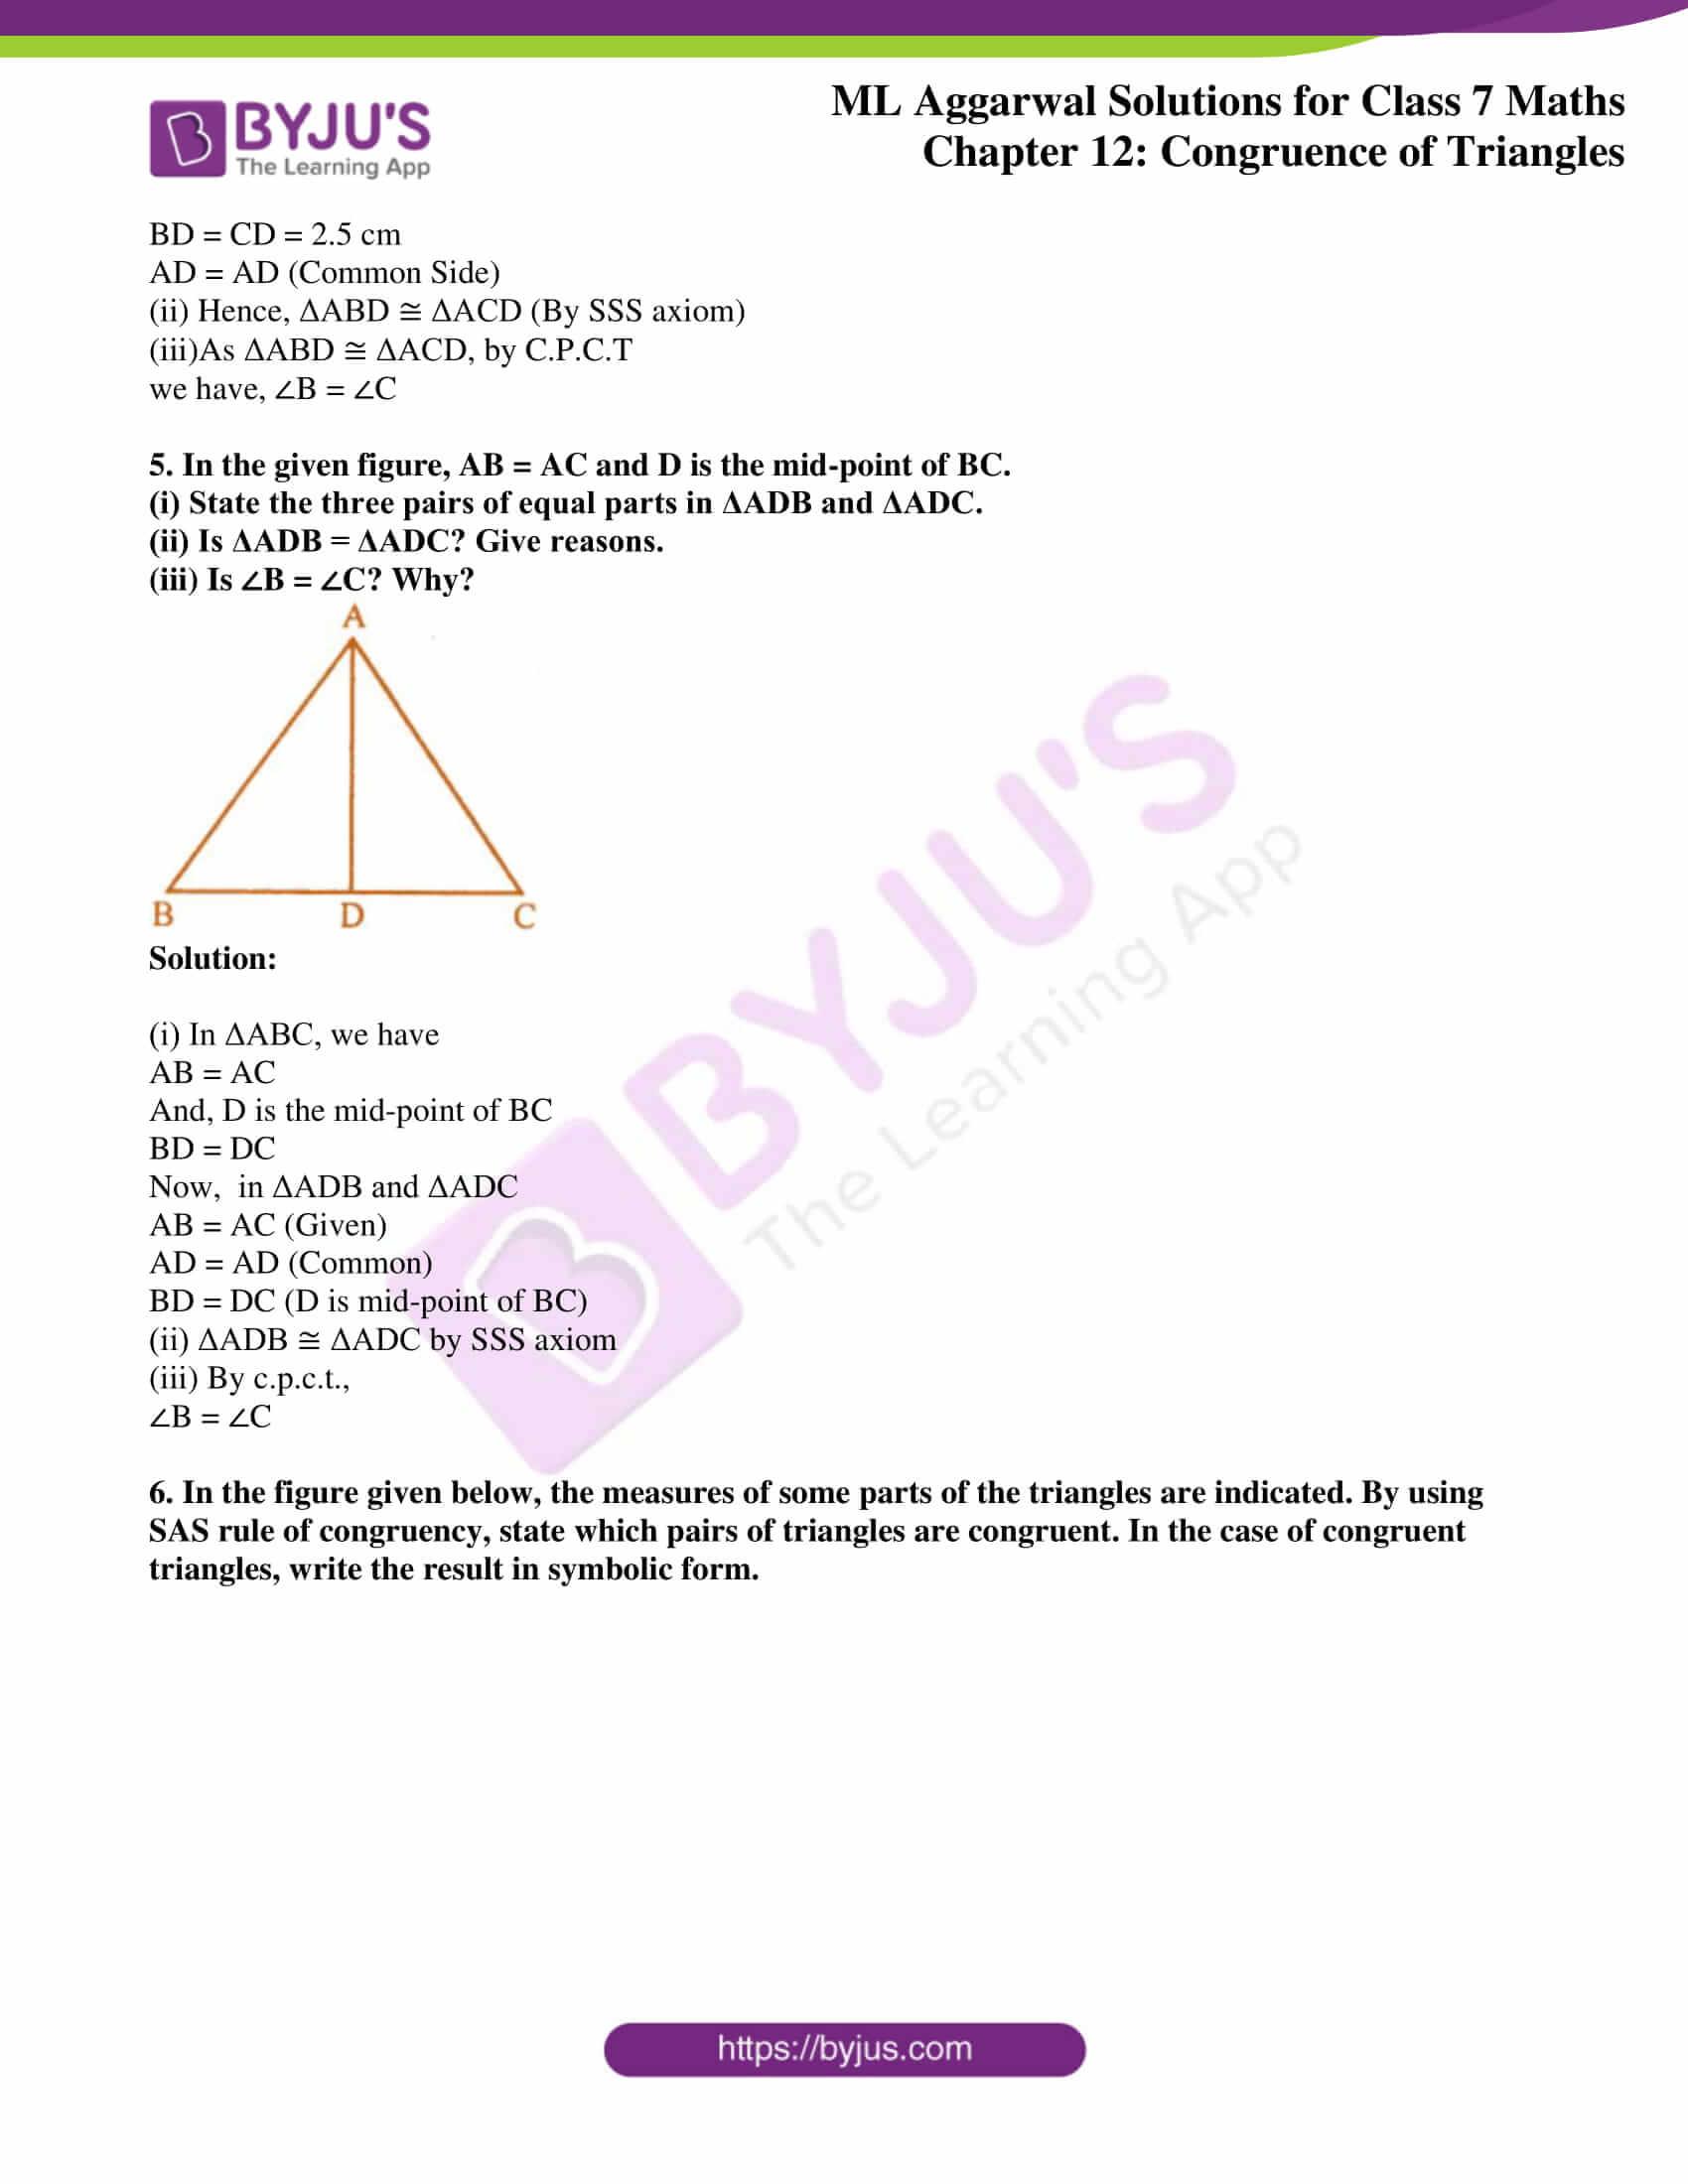 ml aggarwal sol class 7 maths chapter 12 3